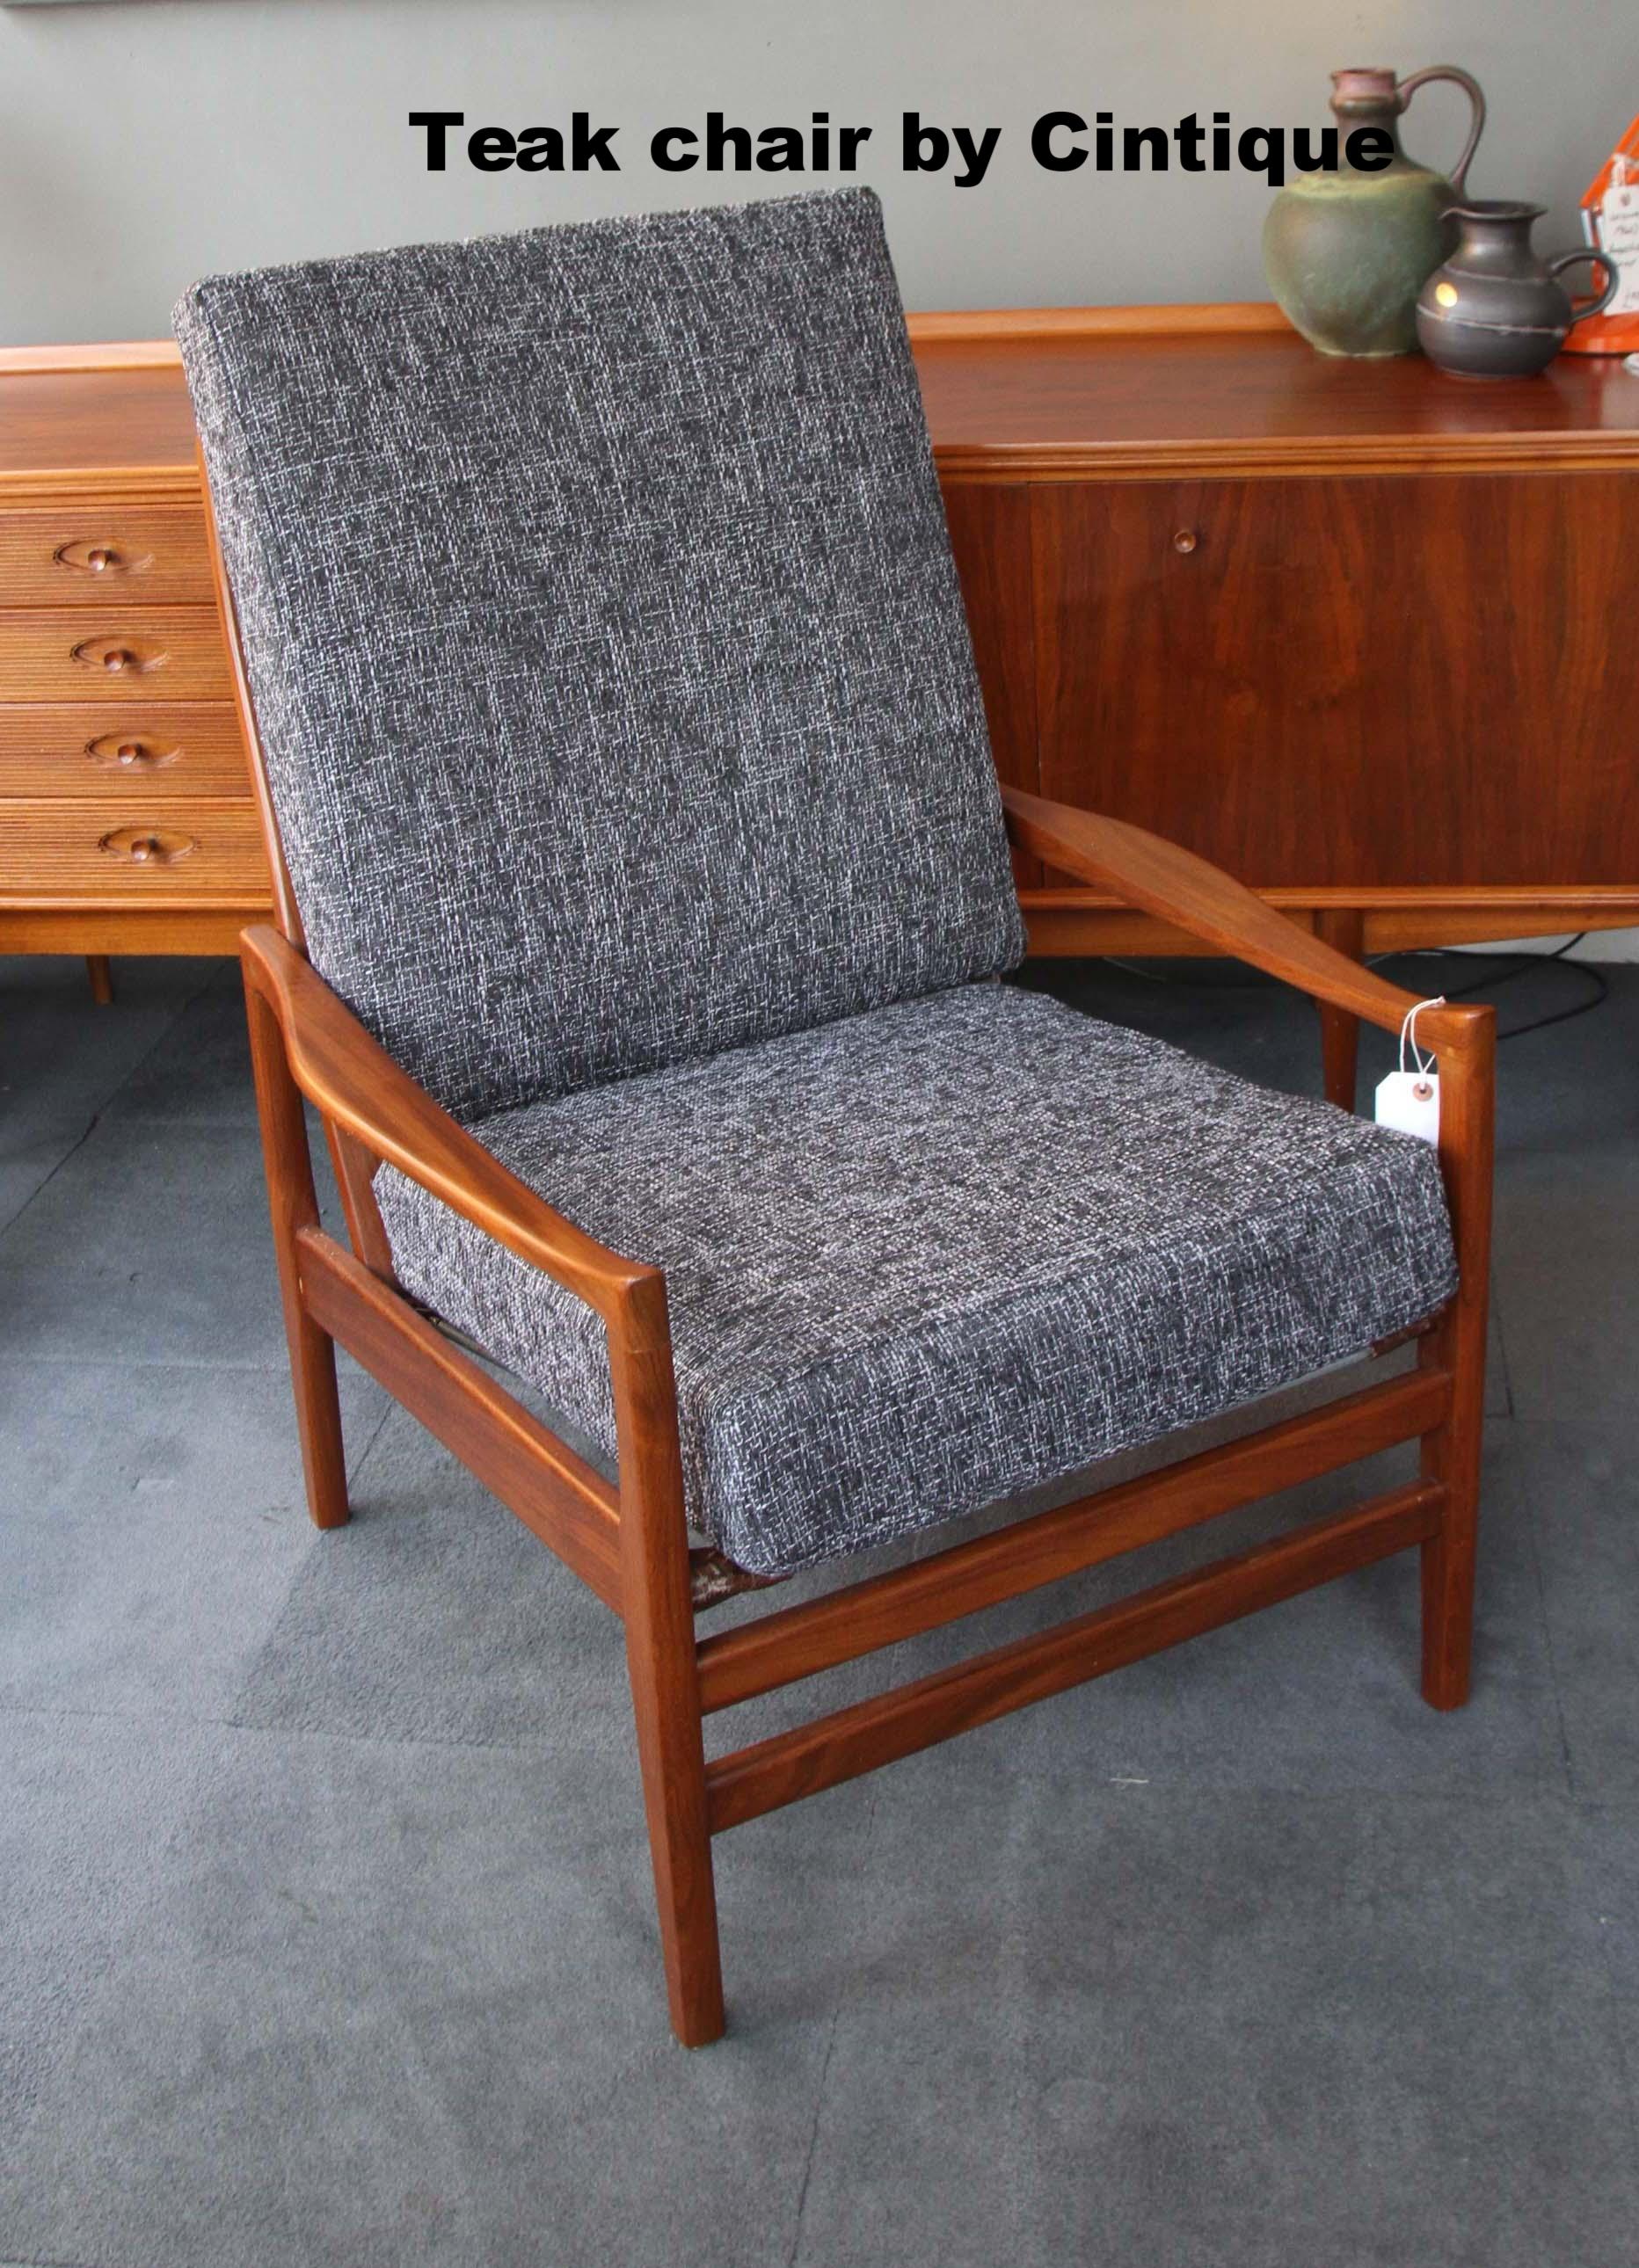 Teak 1970's Chair by Cintique £450